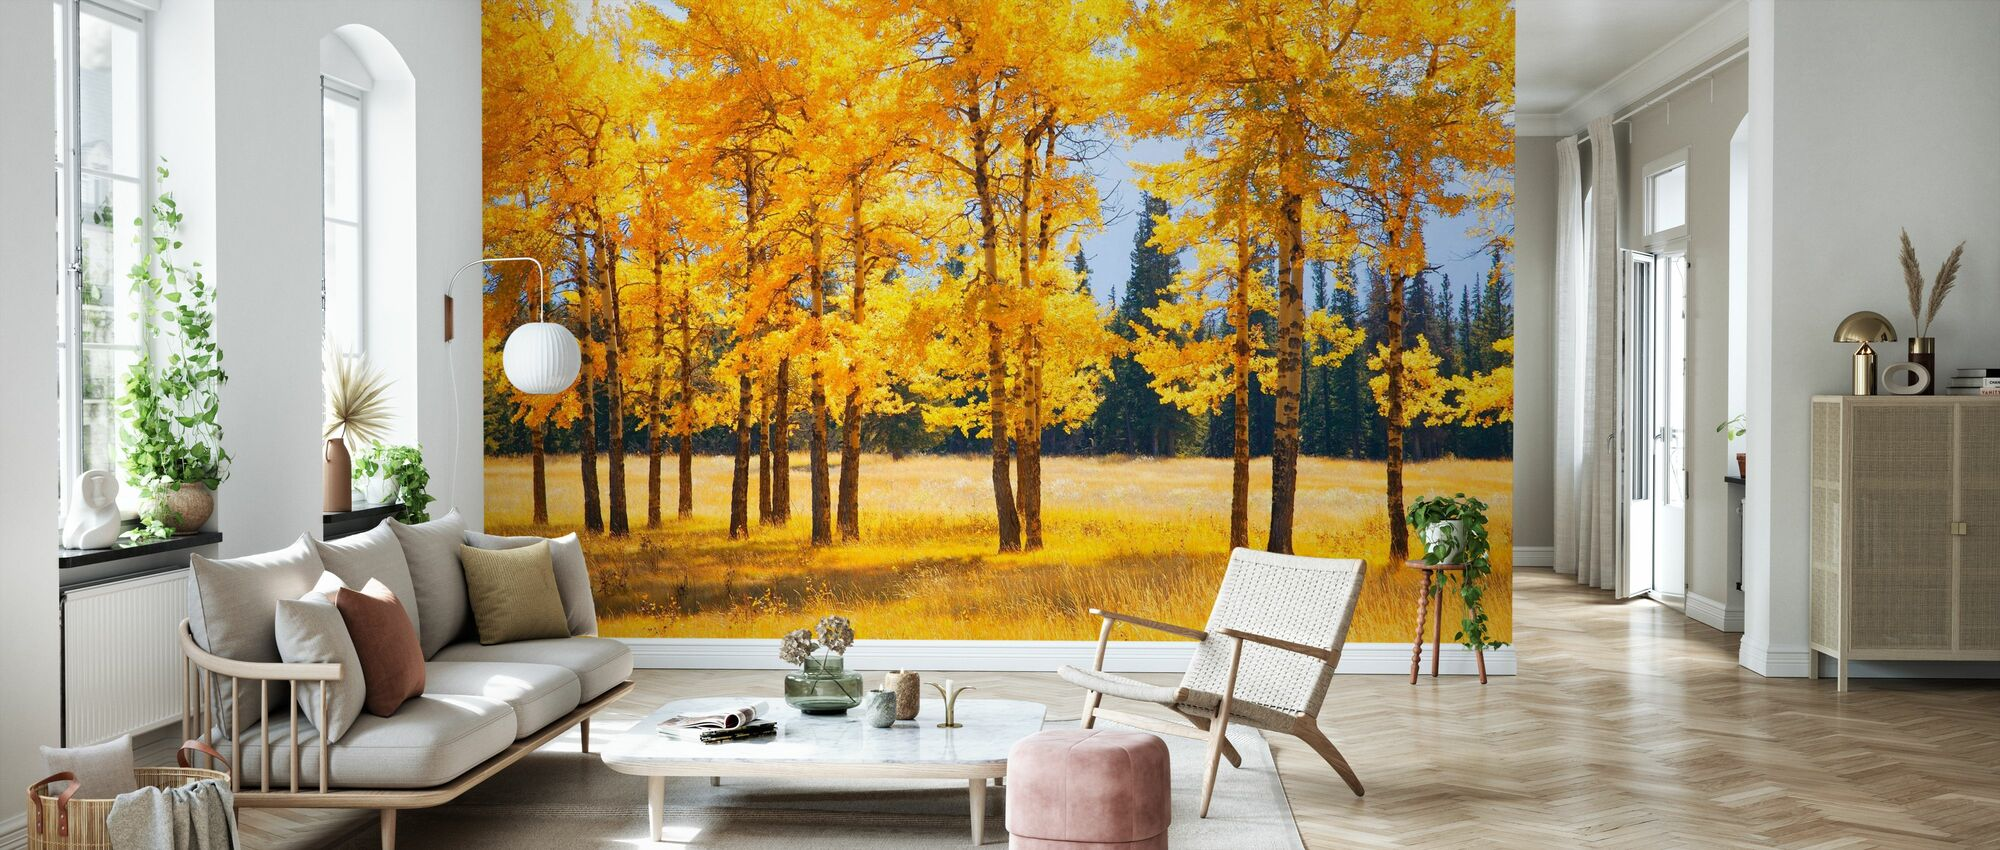 Gele Herfstbomen - Behang - Woonkamer